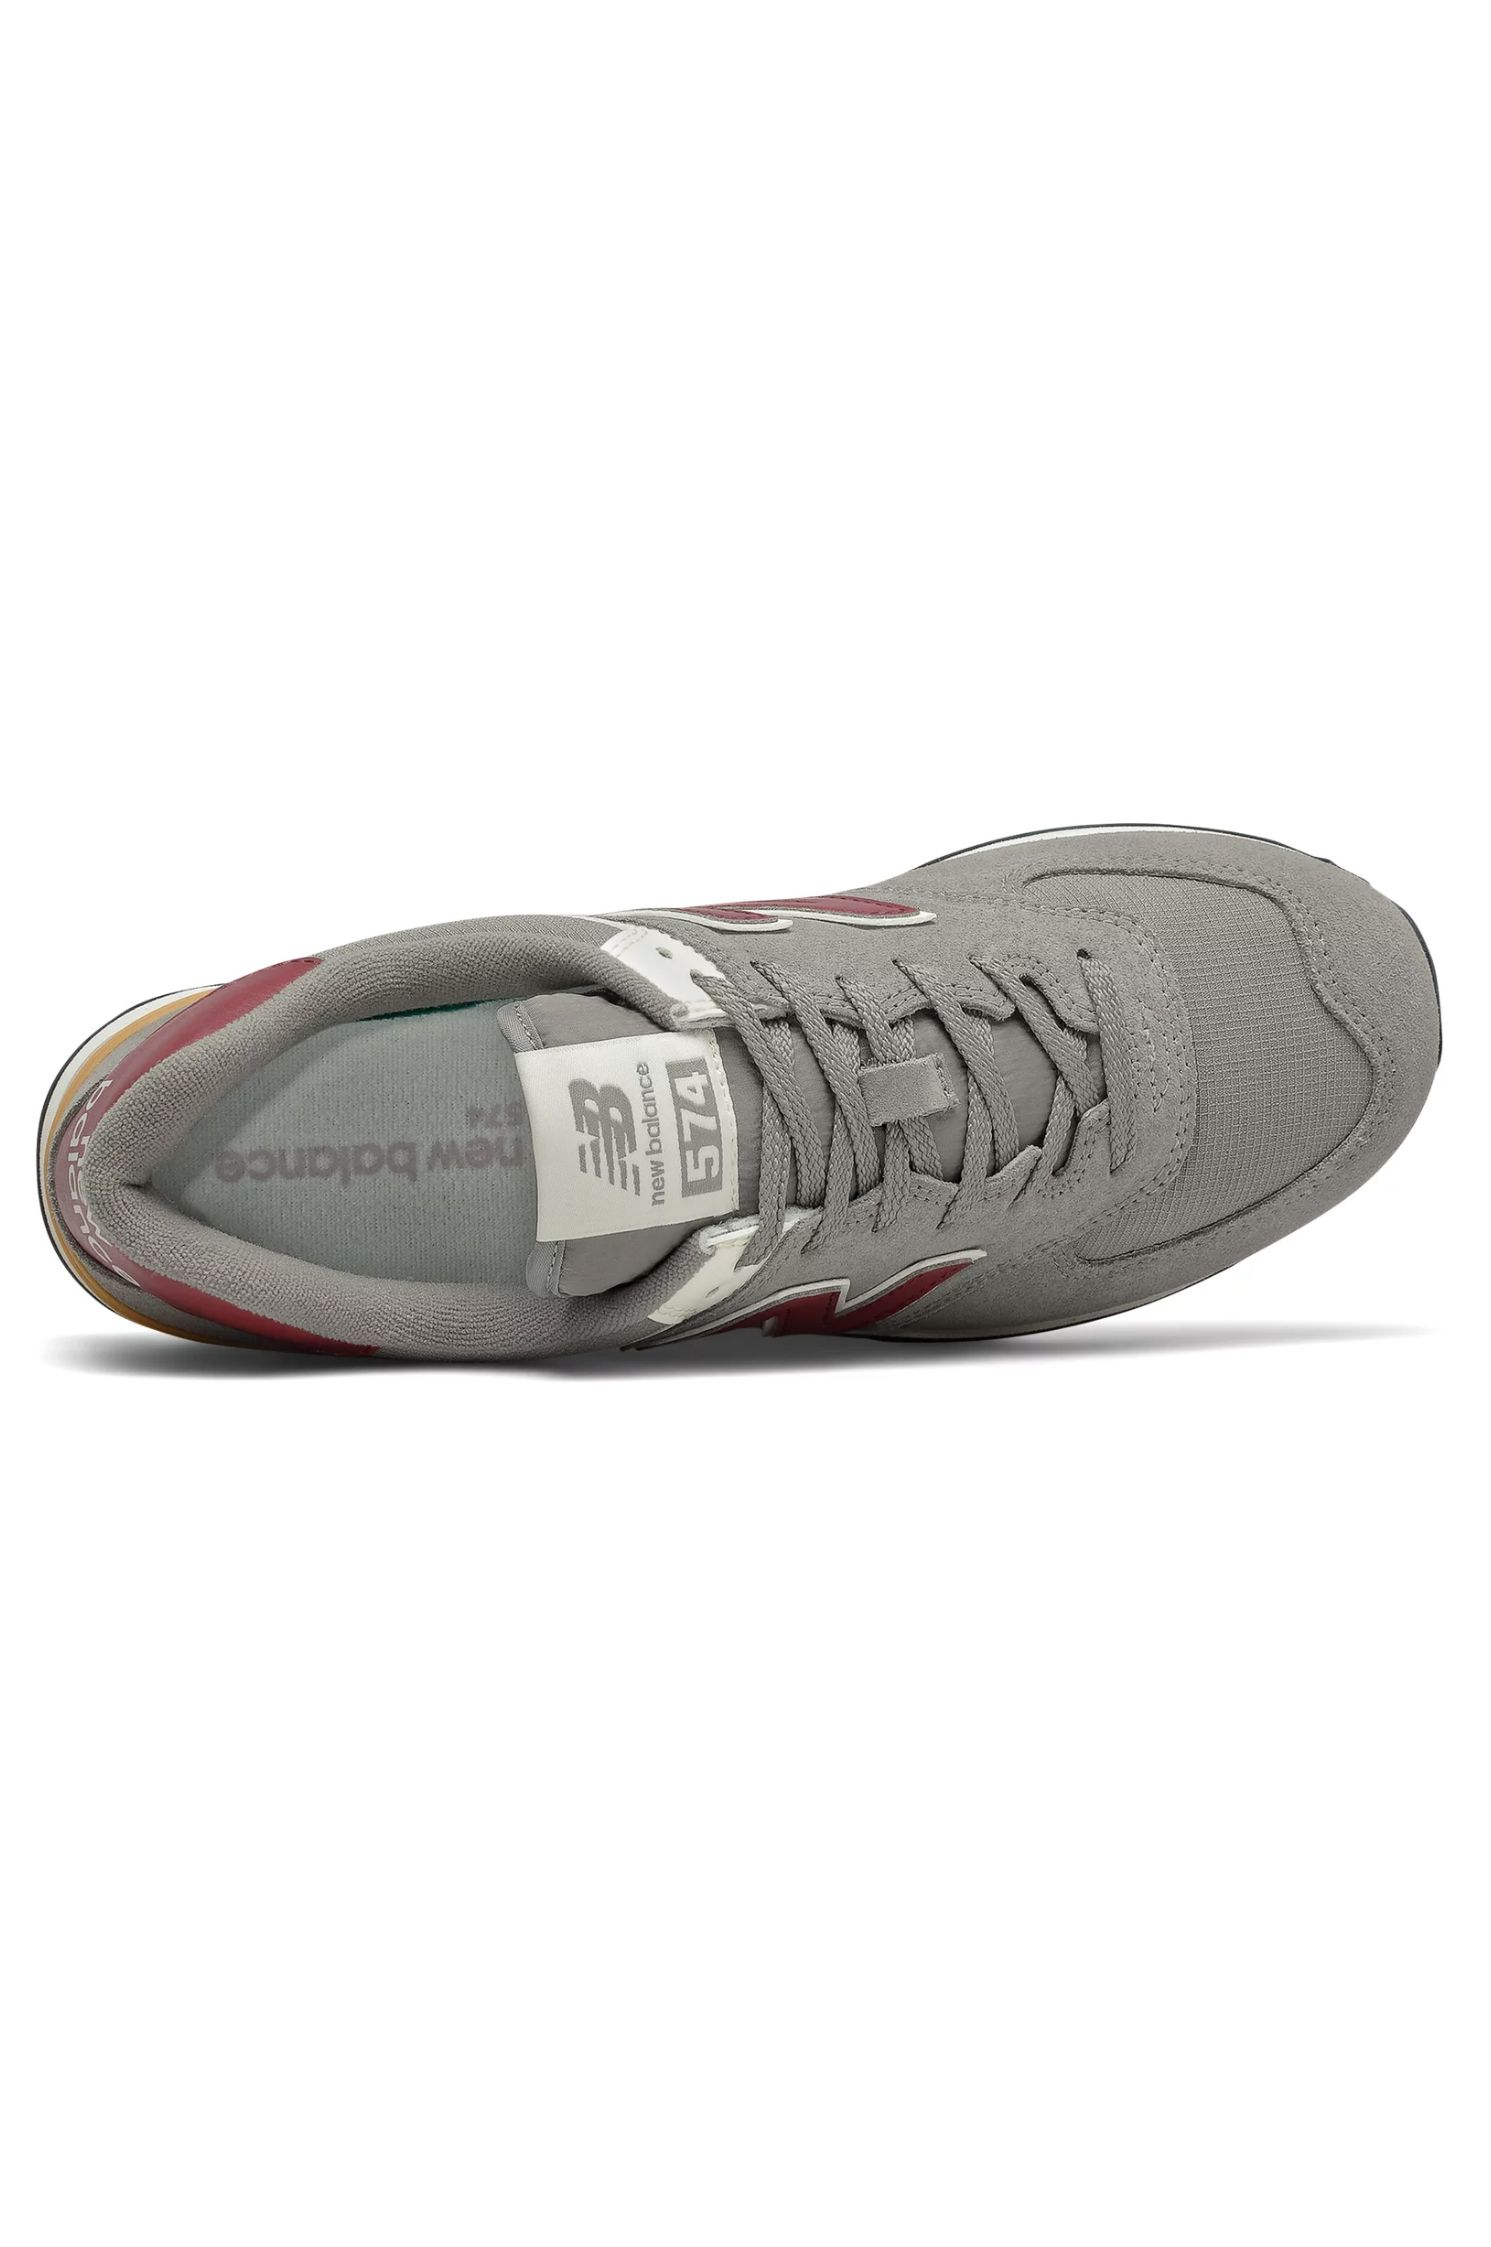 Tenis New Balance ML574 Grey